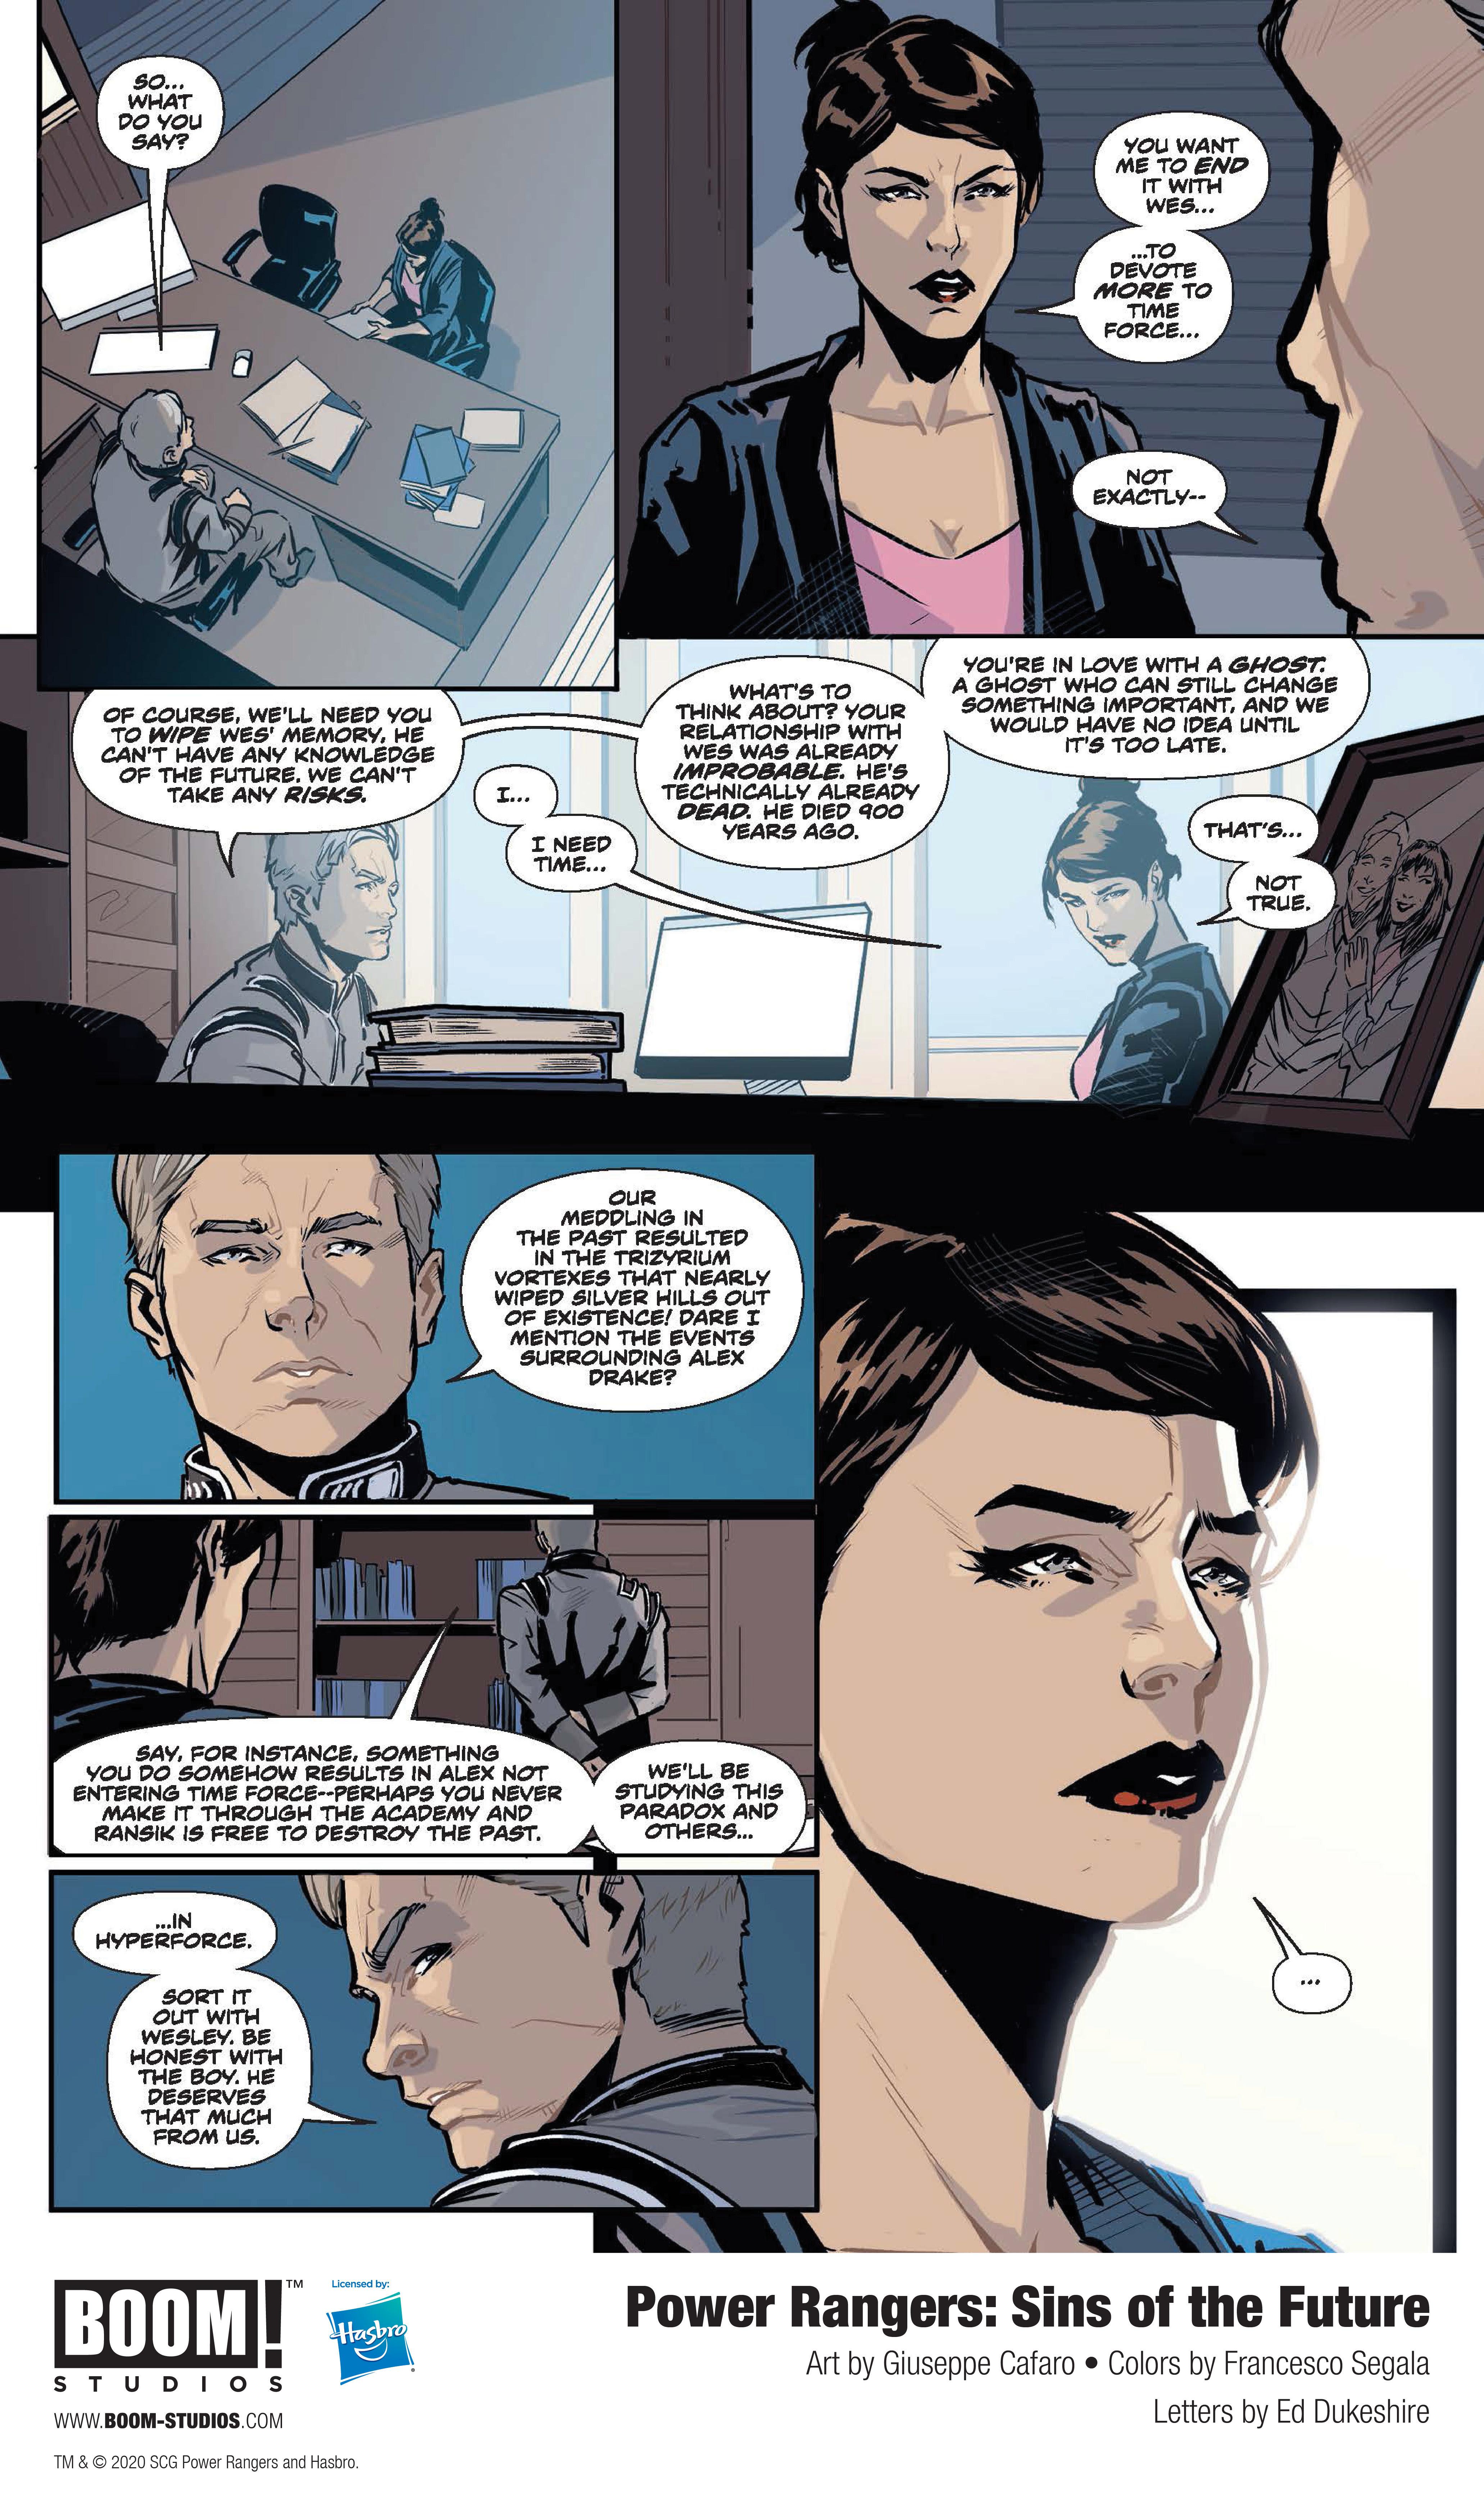 Power Rangers: Sins of the Future Sneak Peek Mentions HyperForce - The Illuminerdi